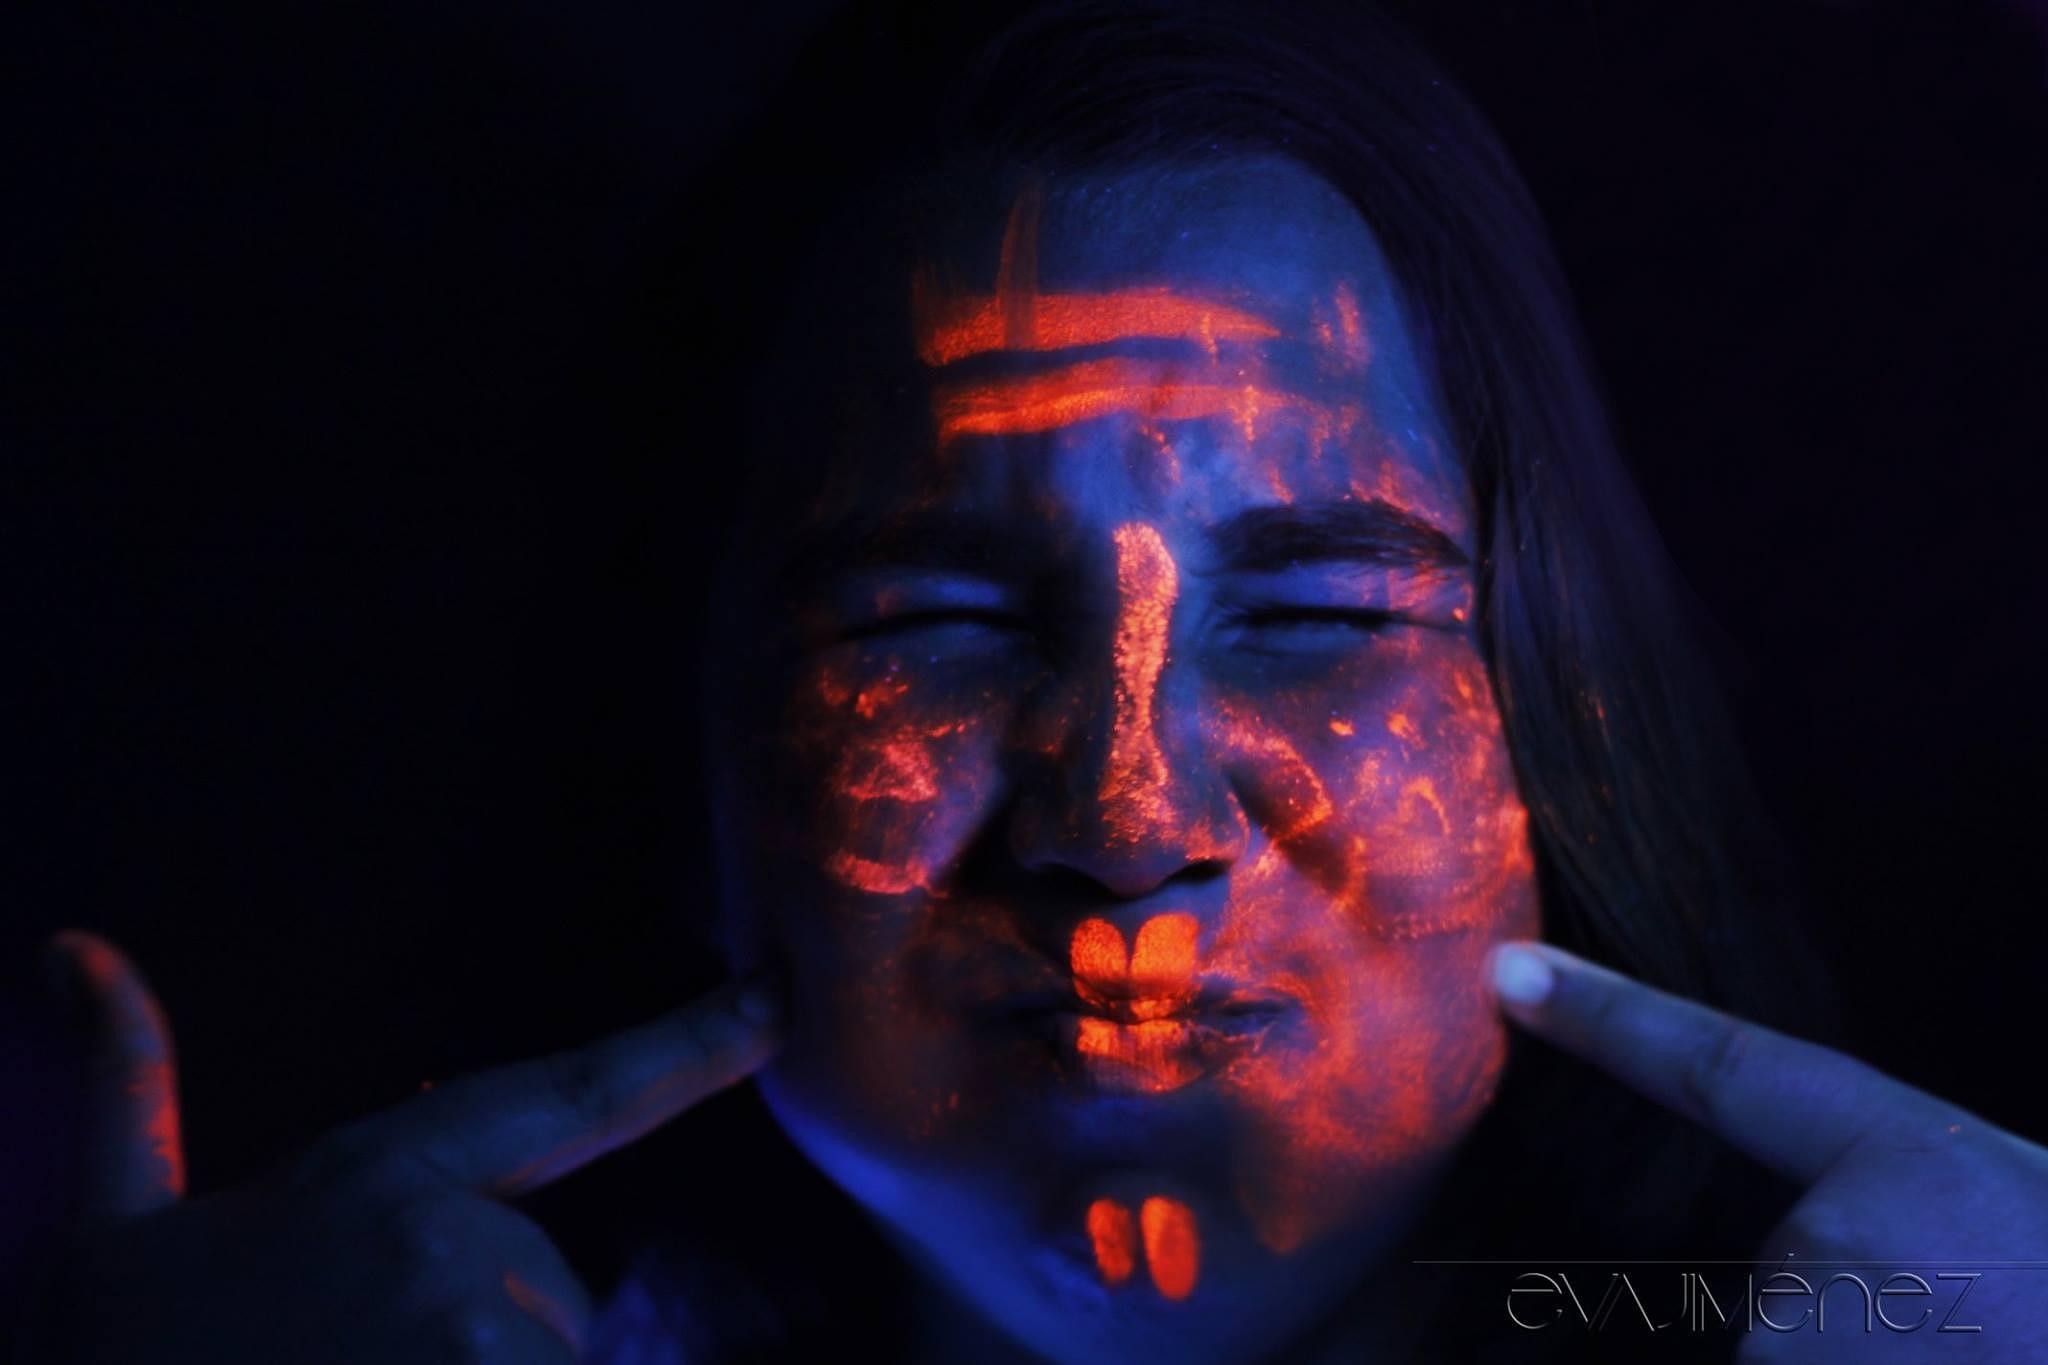 Fluorescent Inocence by Eva Jimenez